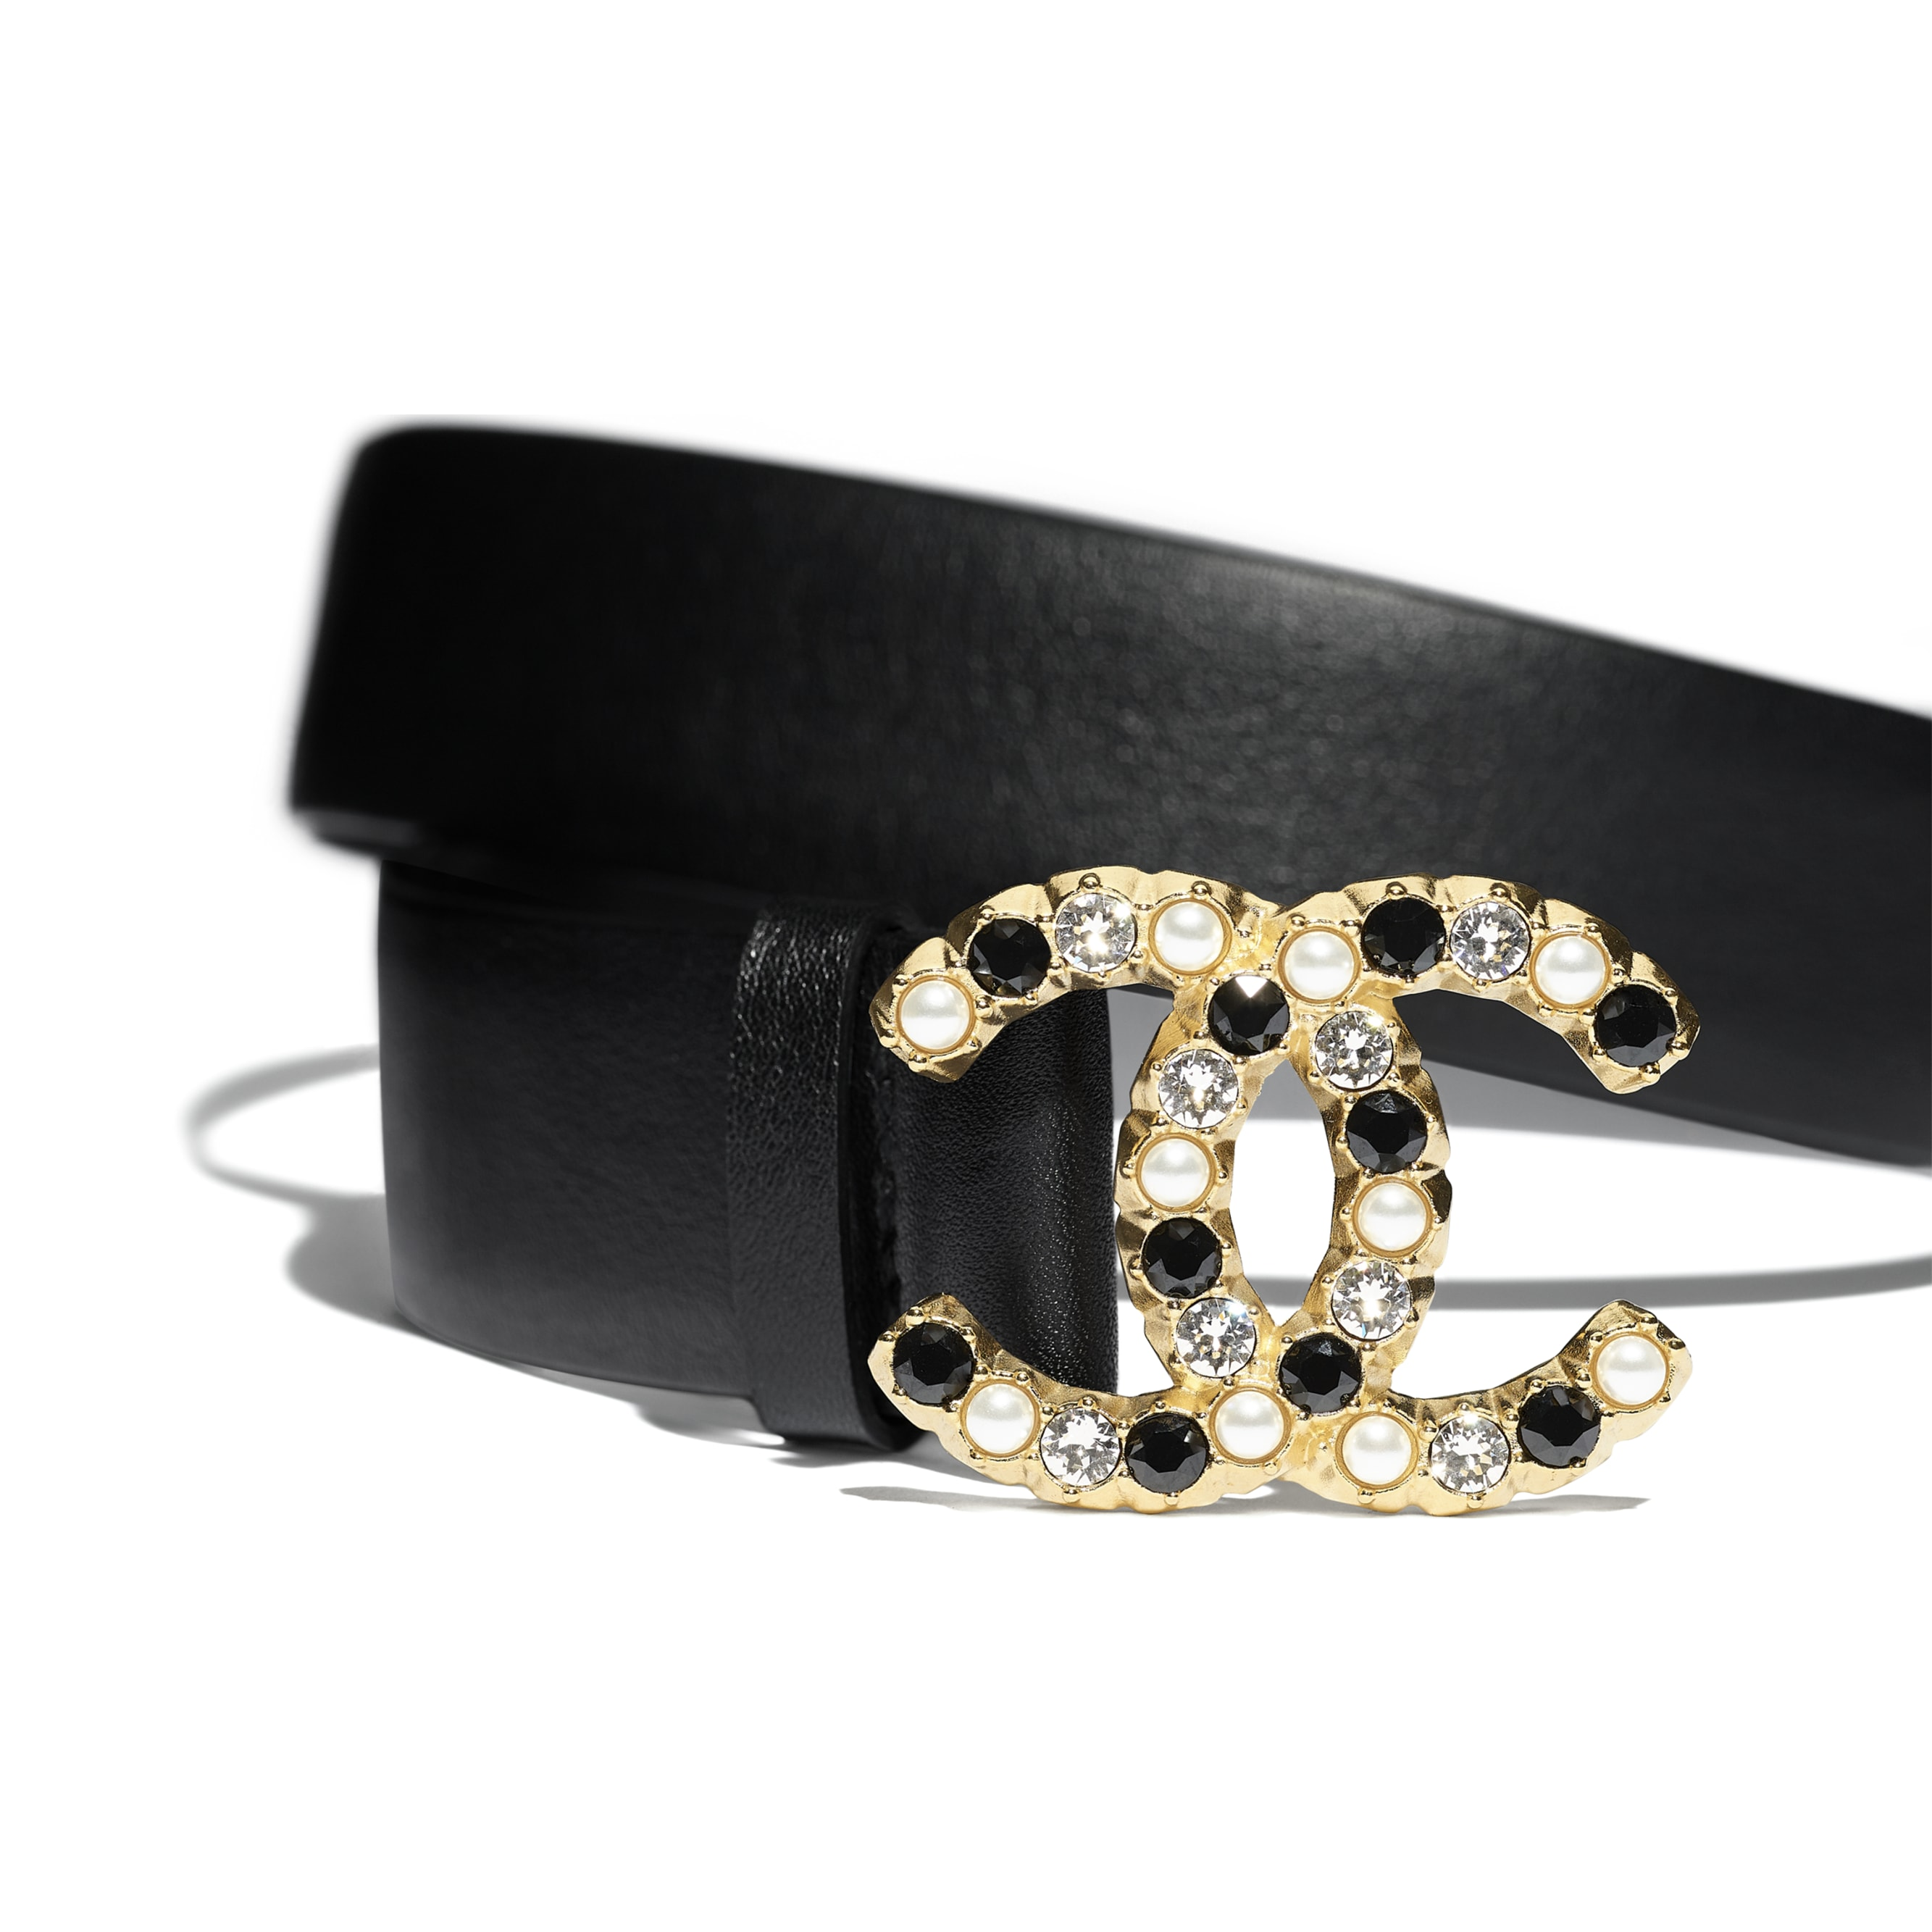 Belt - Black - Calfskin, Gold-Tone Metal, Glass Pearls & Strass - CHANEL - Alternative view - see standard sized version